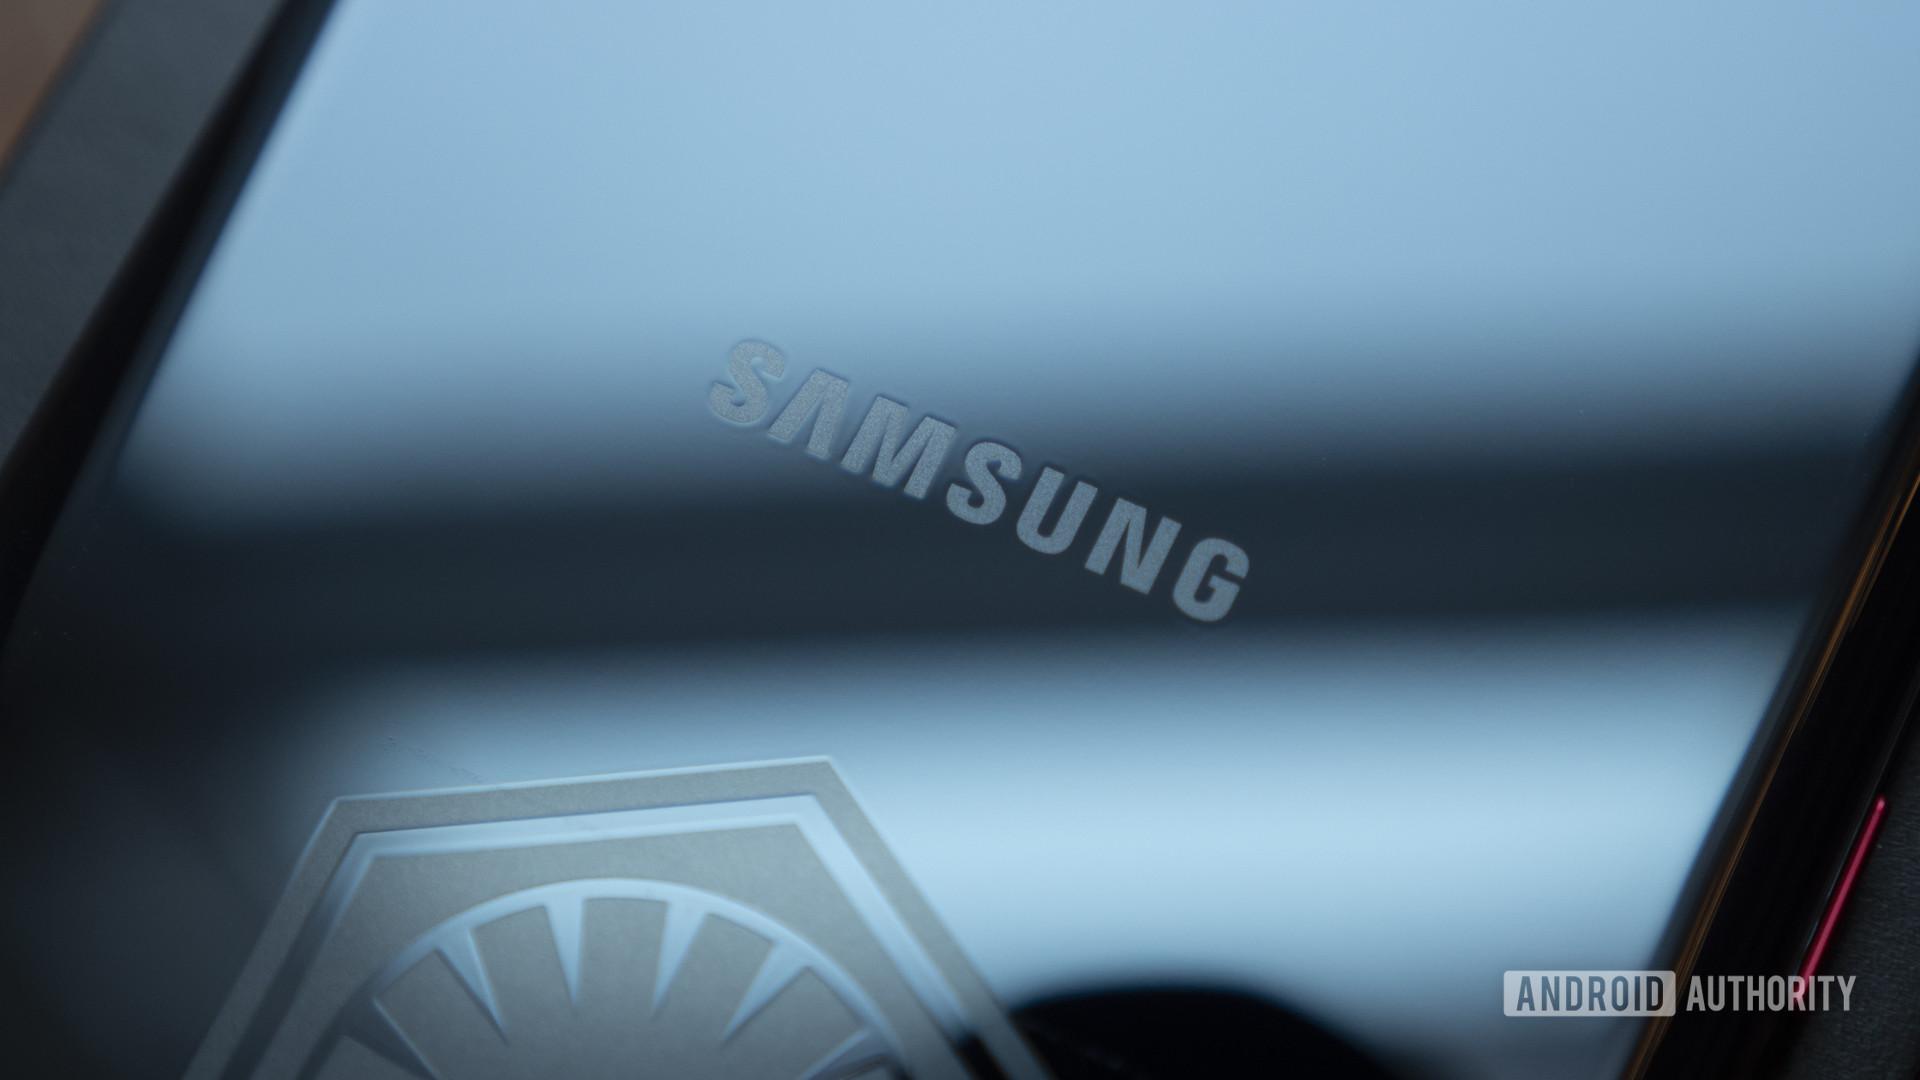 Samsung logo samsung galaxy note 10 plus star wars edition 3